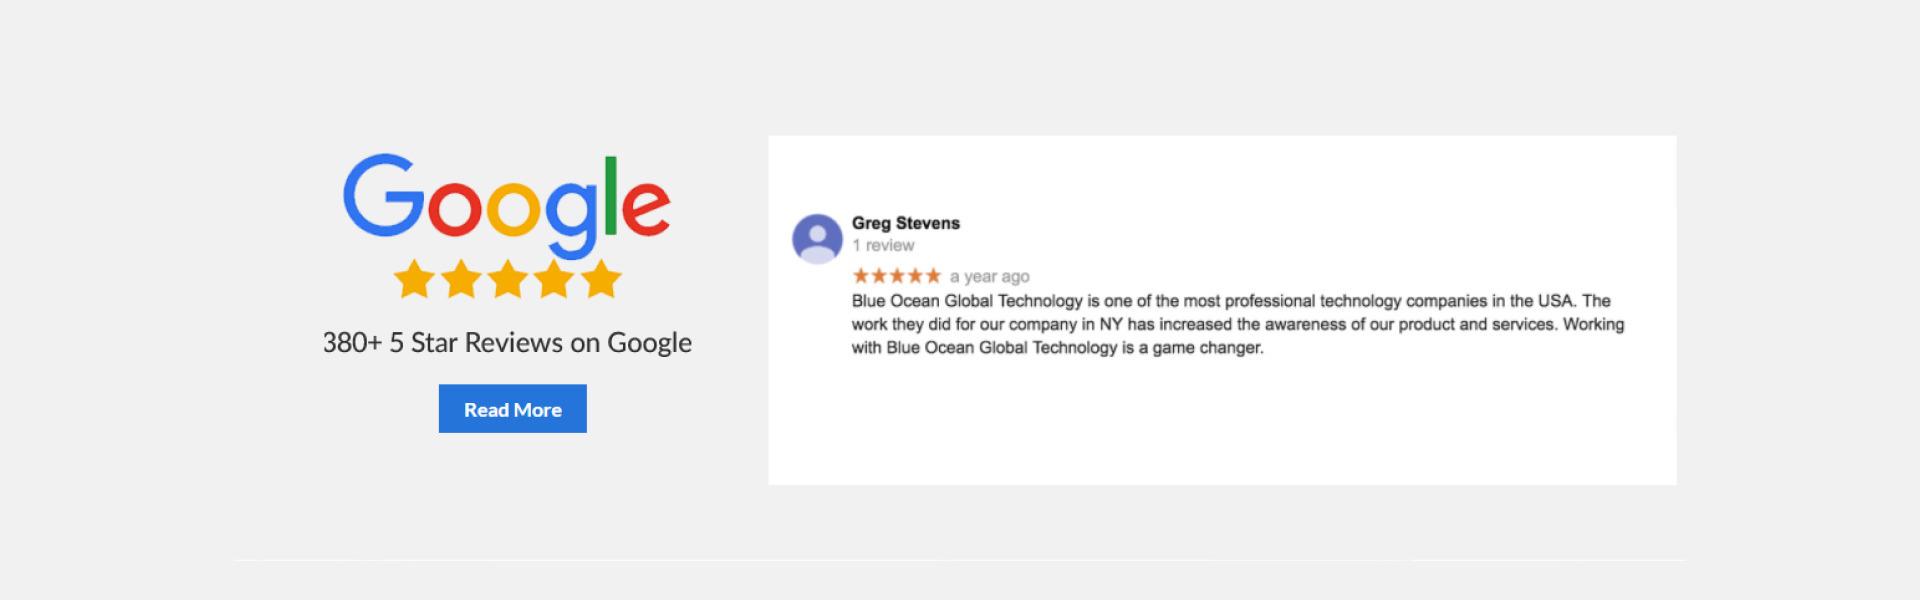 Google Customer Reviews and Ratings